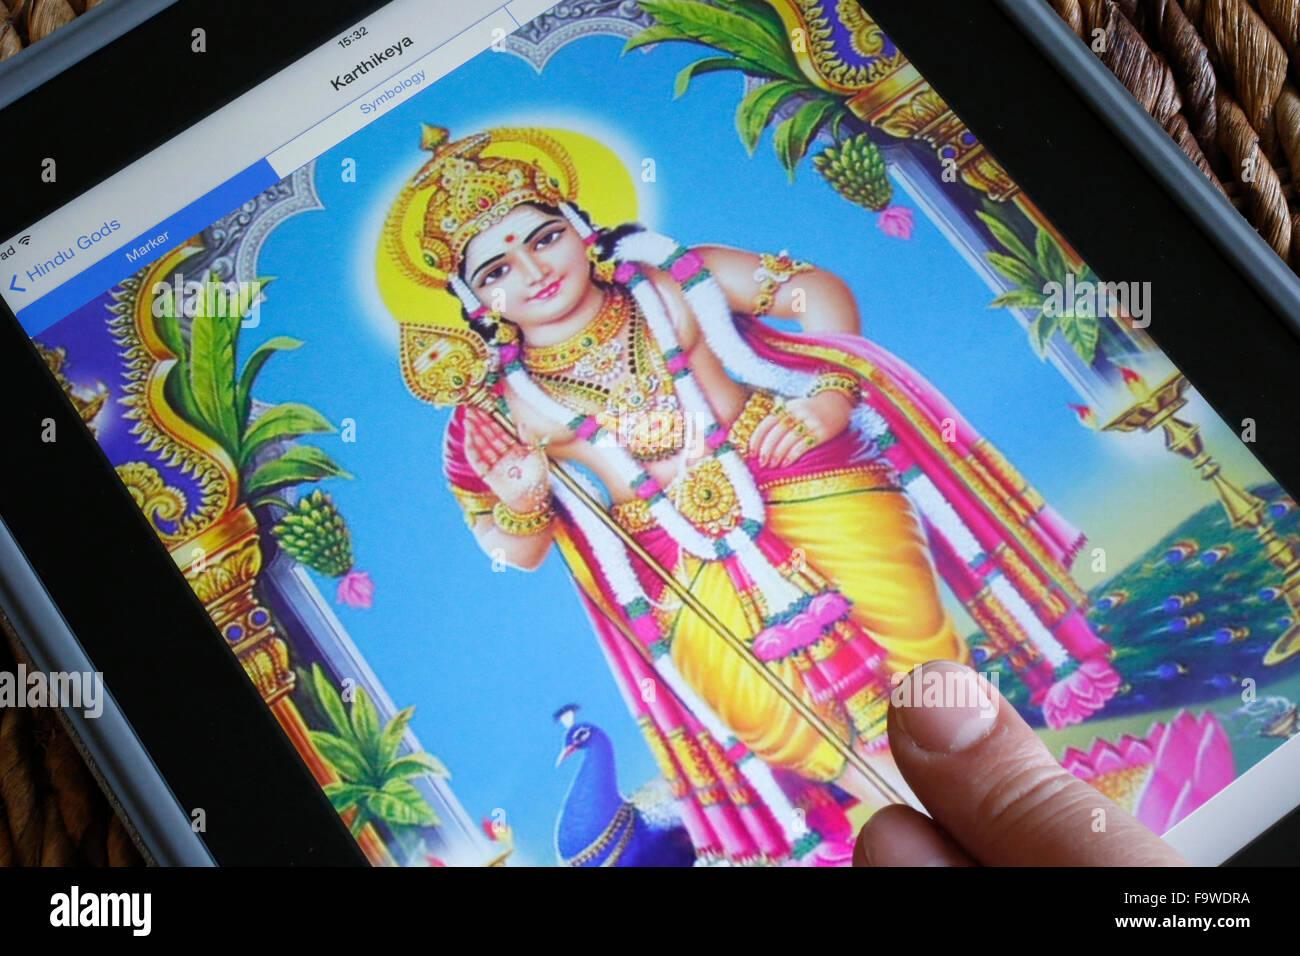 Hindu deity on an Ipad. Karthikeya. - Stock Image